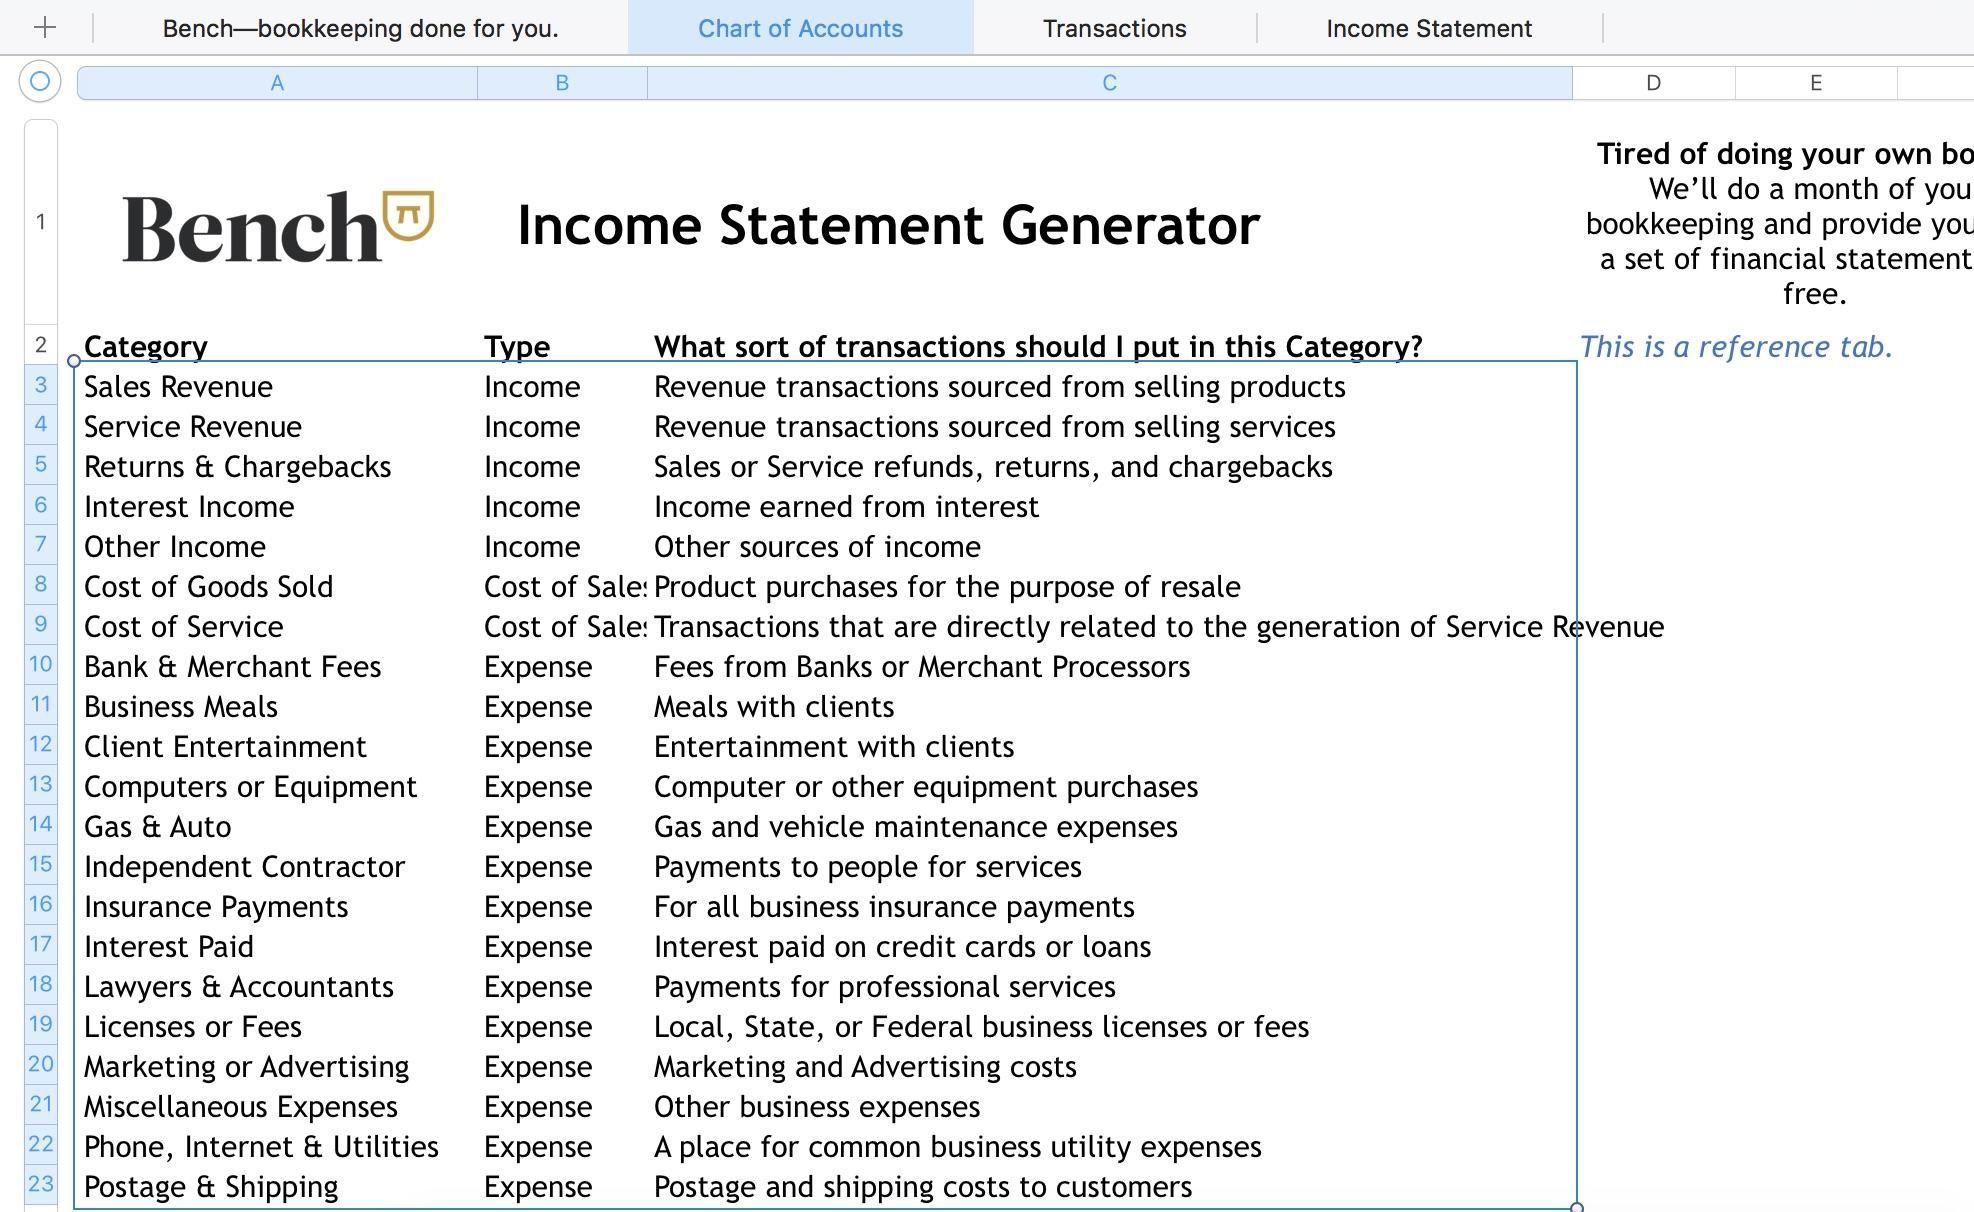 005 Unique Income Statement Format In Excel Download Idea Full